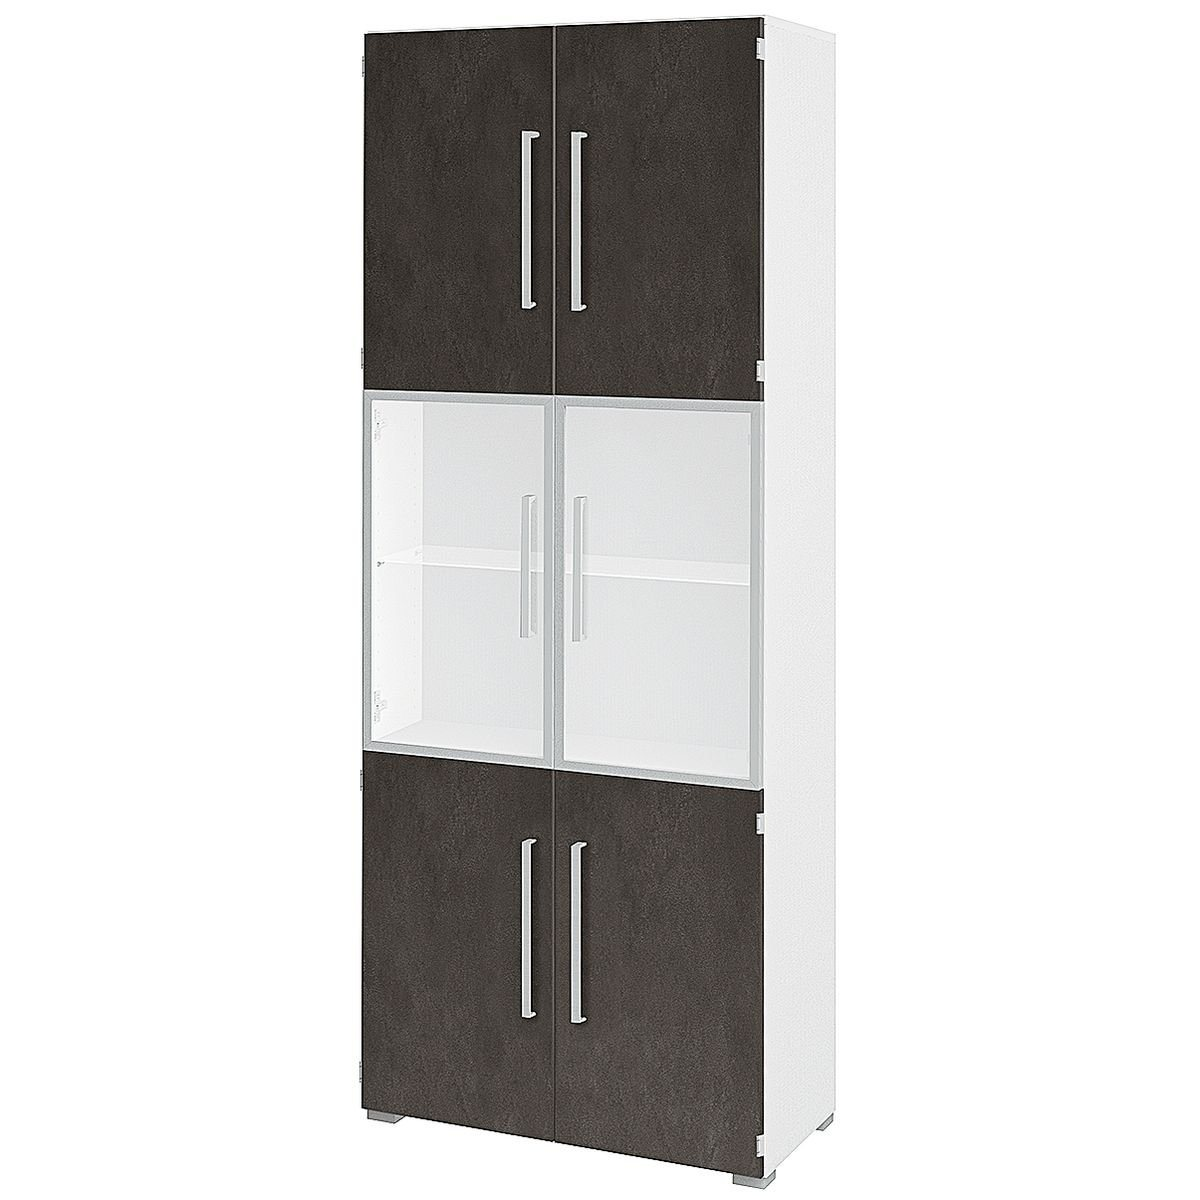 Aktenschrank 6 OH breit 1 Vitrinentür »Objekt Plus« | Büro > Büroschränke > Aktenschränke | Kunststoff | KEINE MARKE